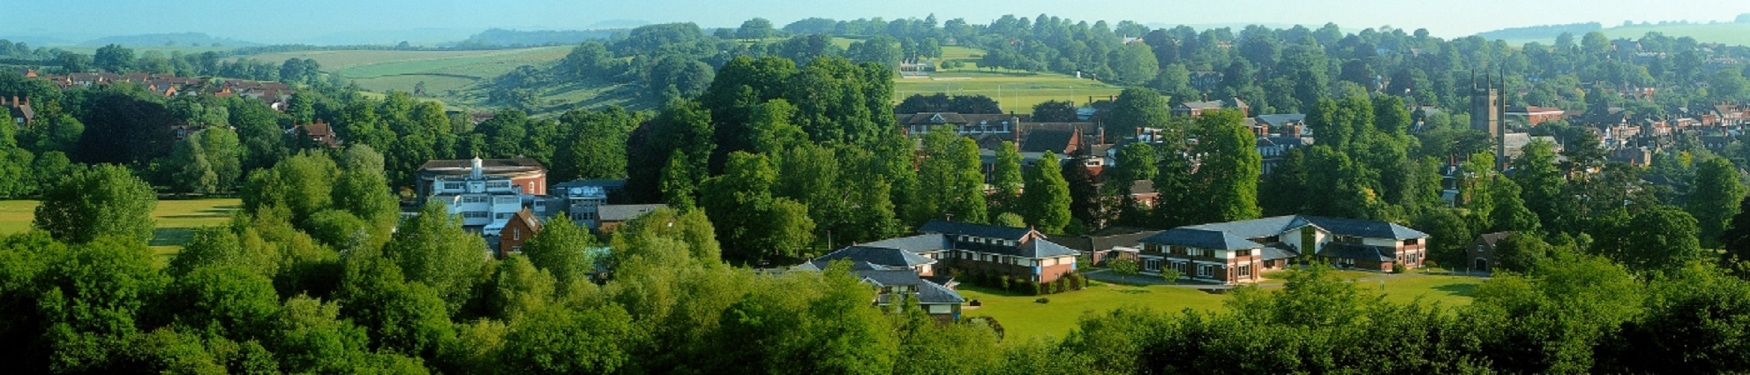 Marborough College - A birds eye view